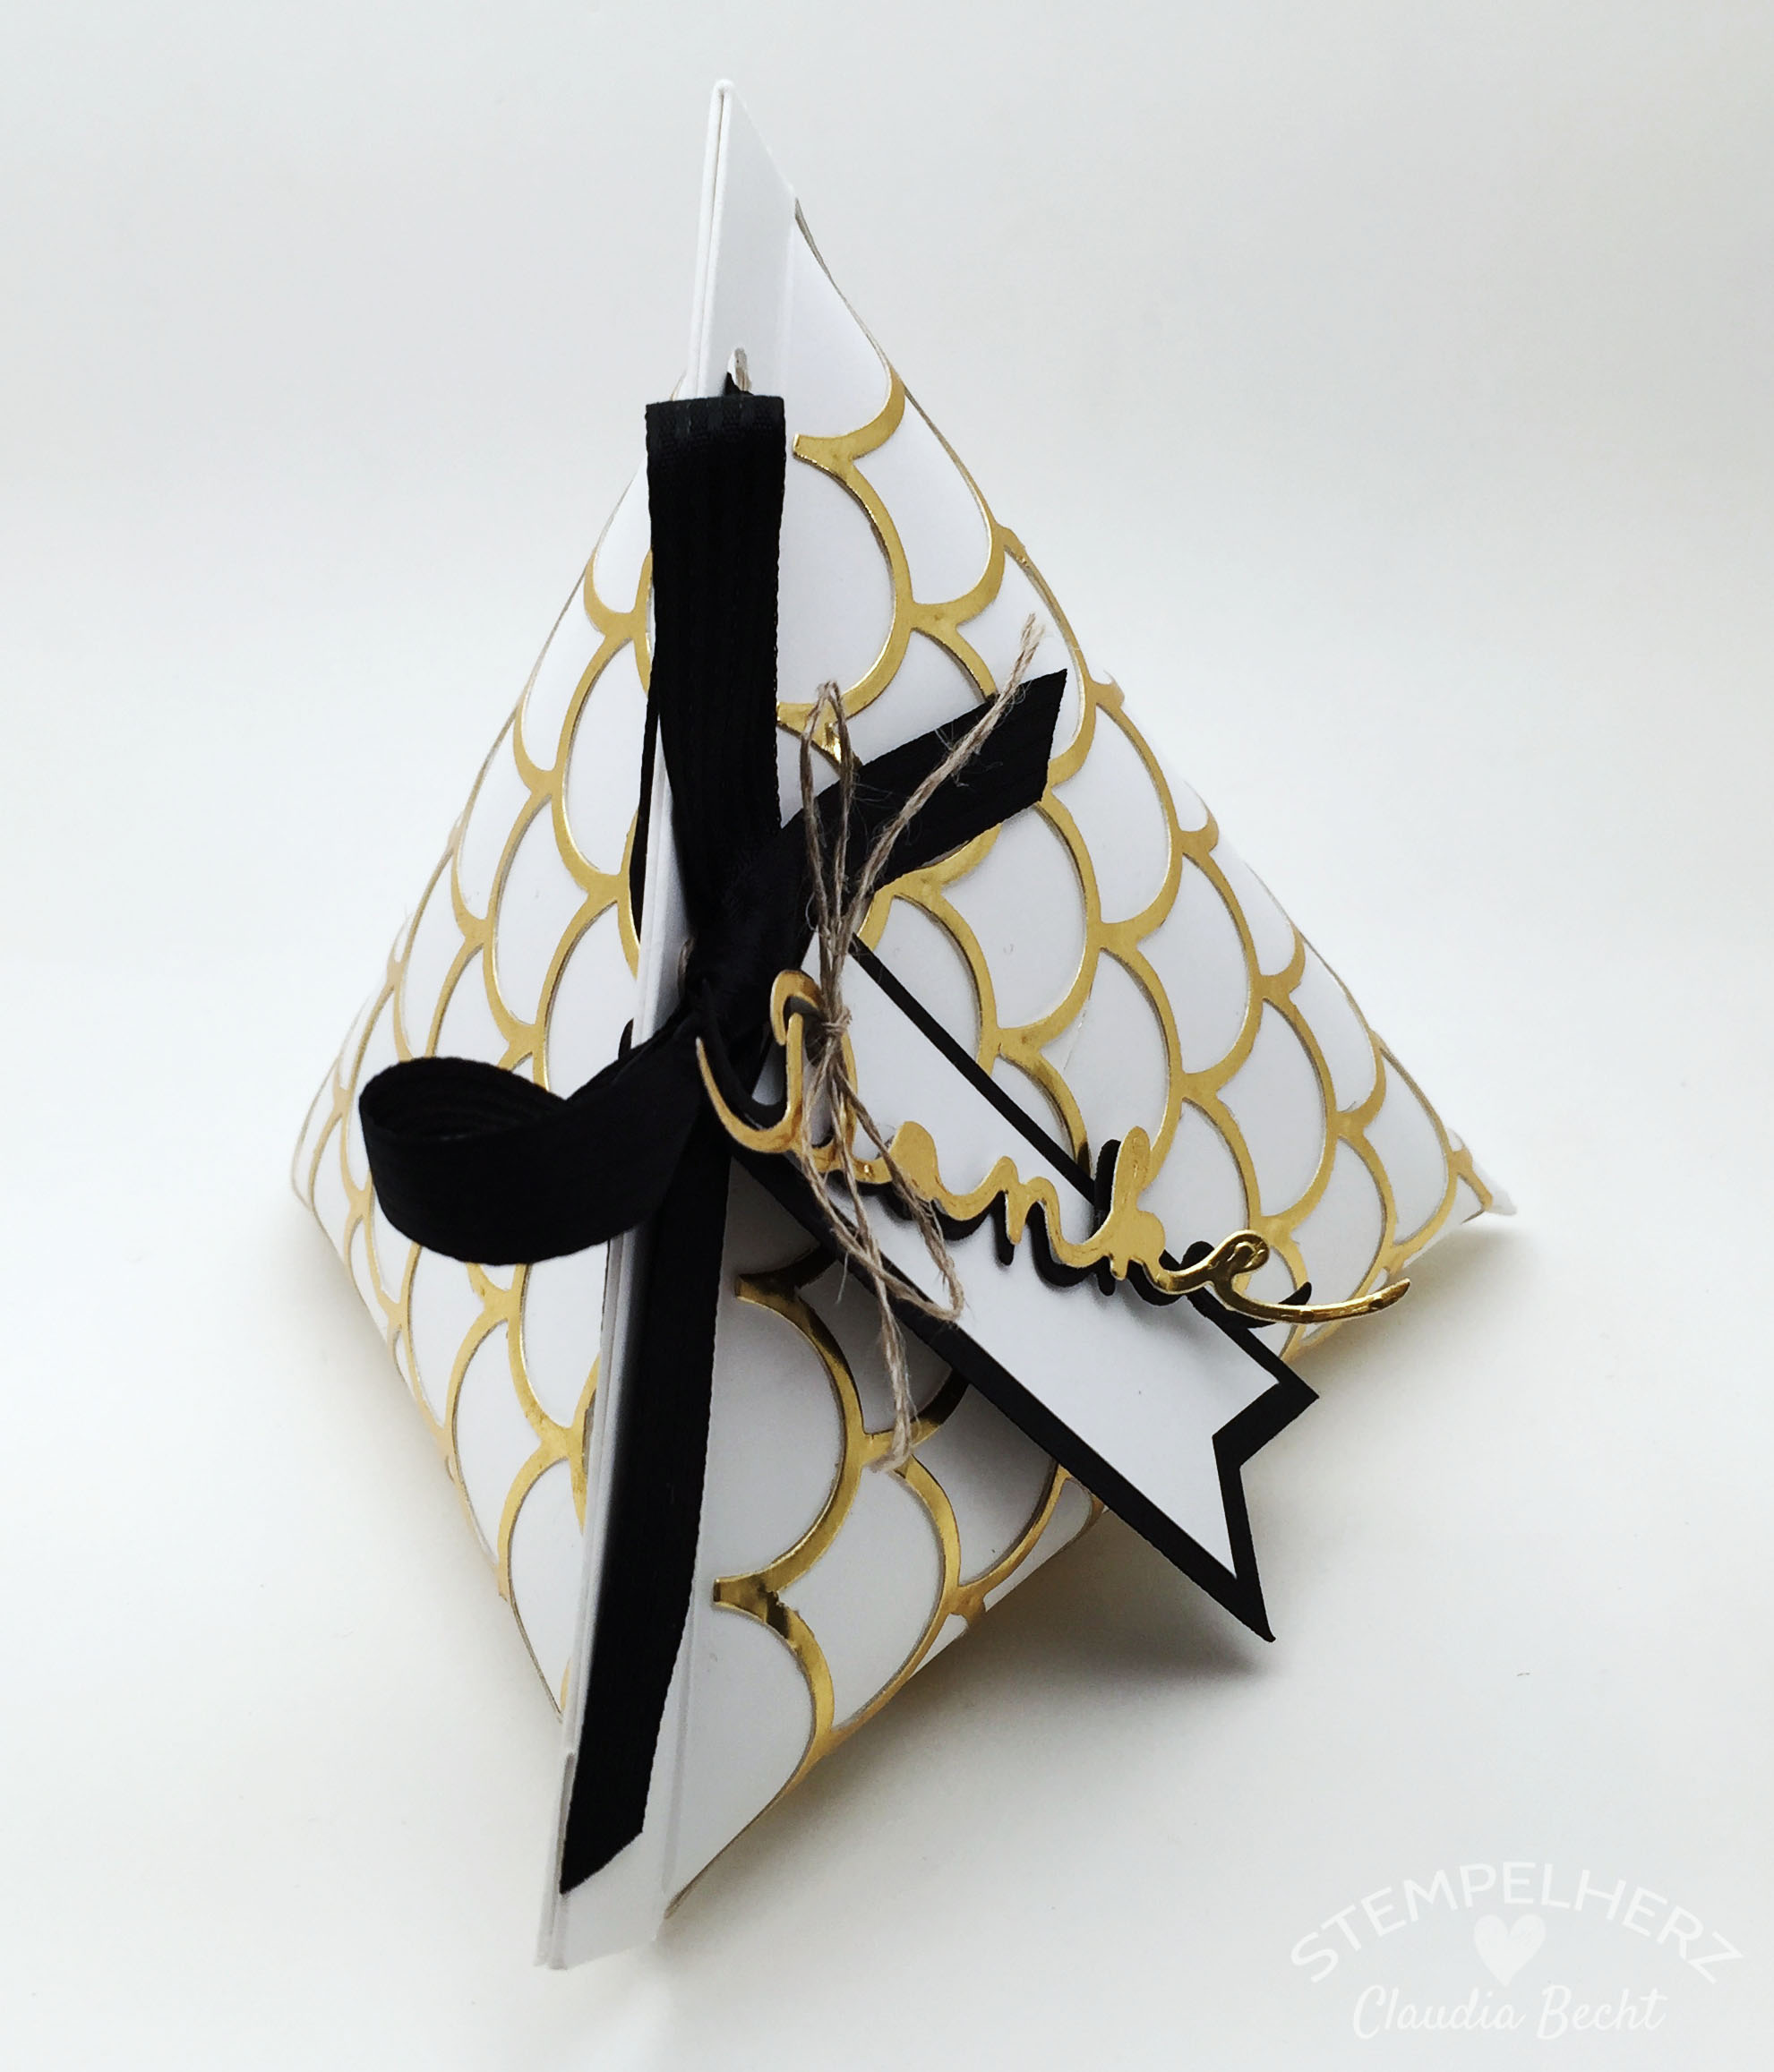 Stampin Up-Stempelherz-Verpackung-Box-Tetra Pak-Verpackung Danke Gold-Schwarz-Weiß 03b